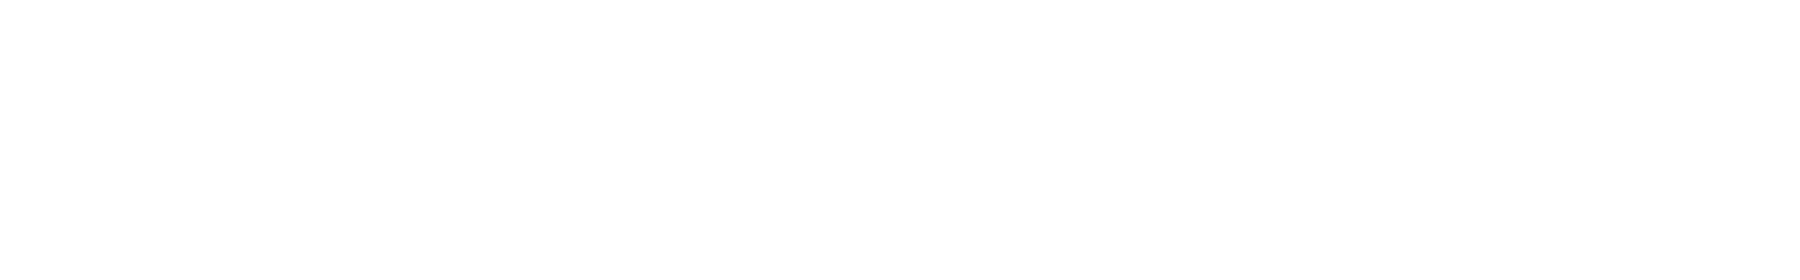 vedh melodyloop 042 fm 124bpm